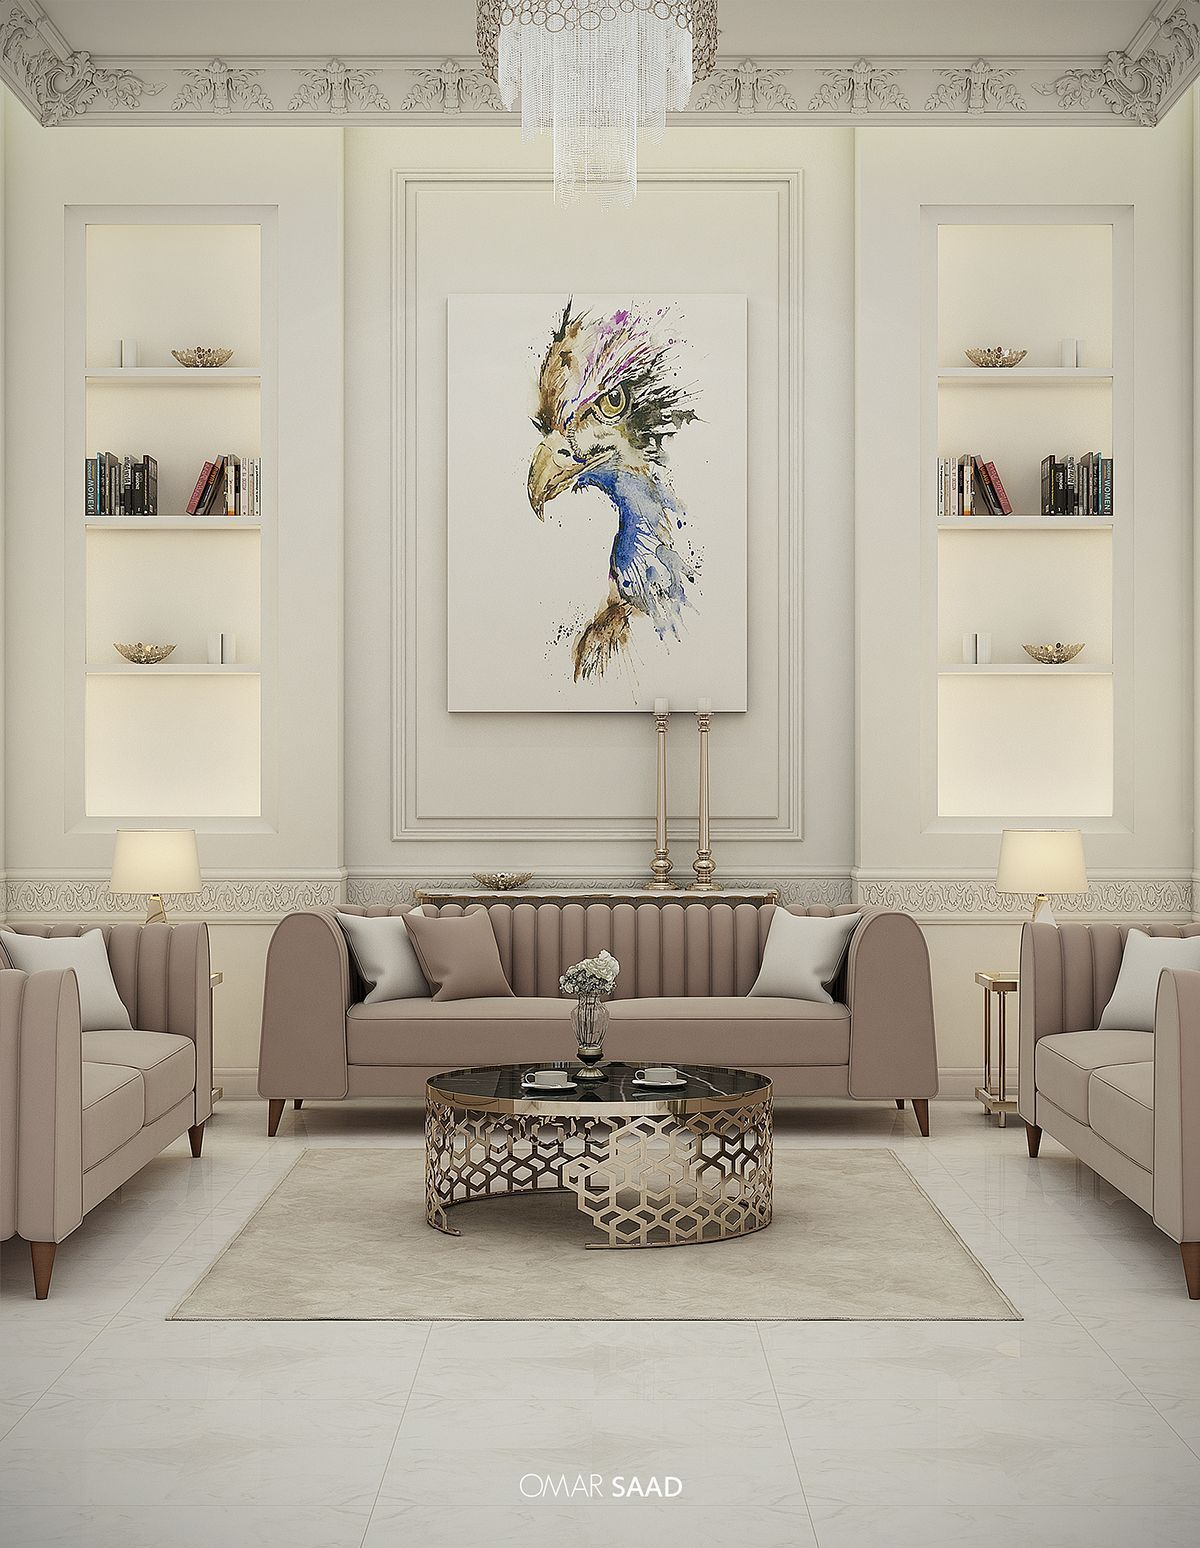 f43015c05f362e9ebc94cad8d8687027 - 38+ Modern Classic Small House Modern Living Room Design Images